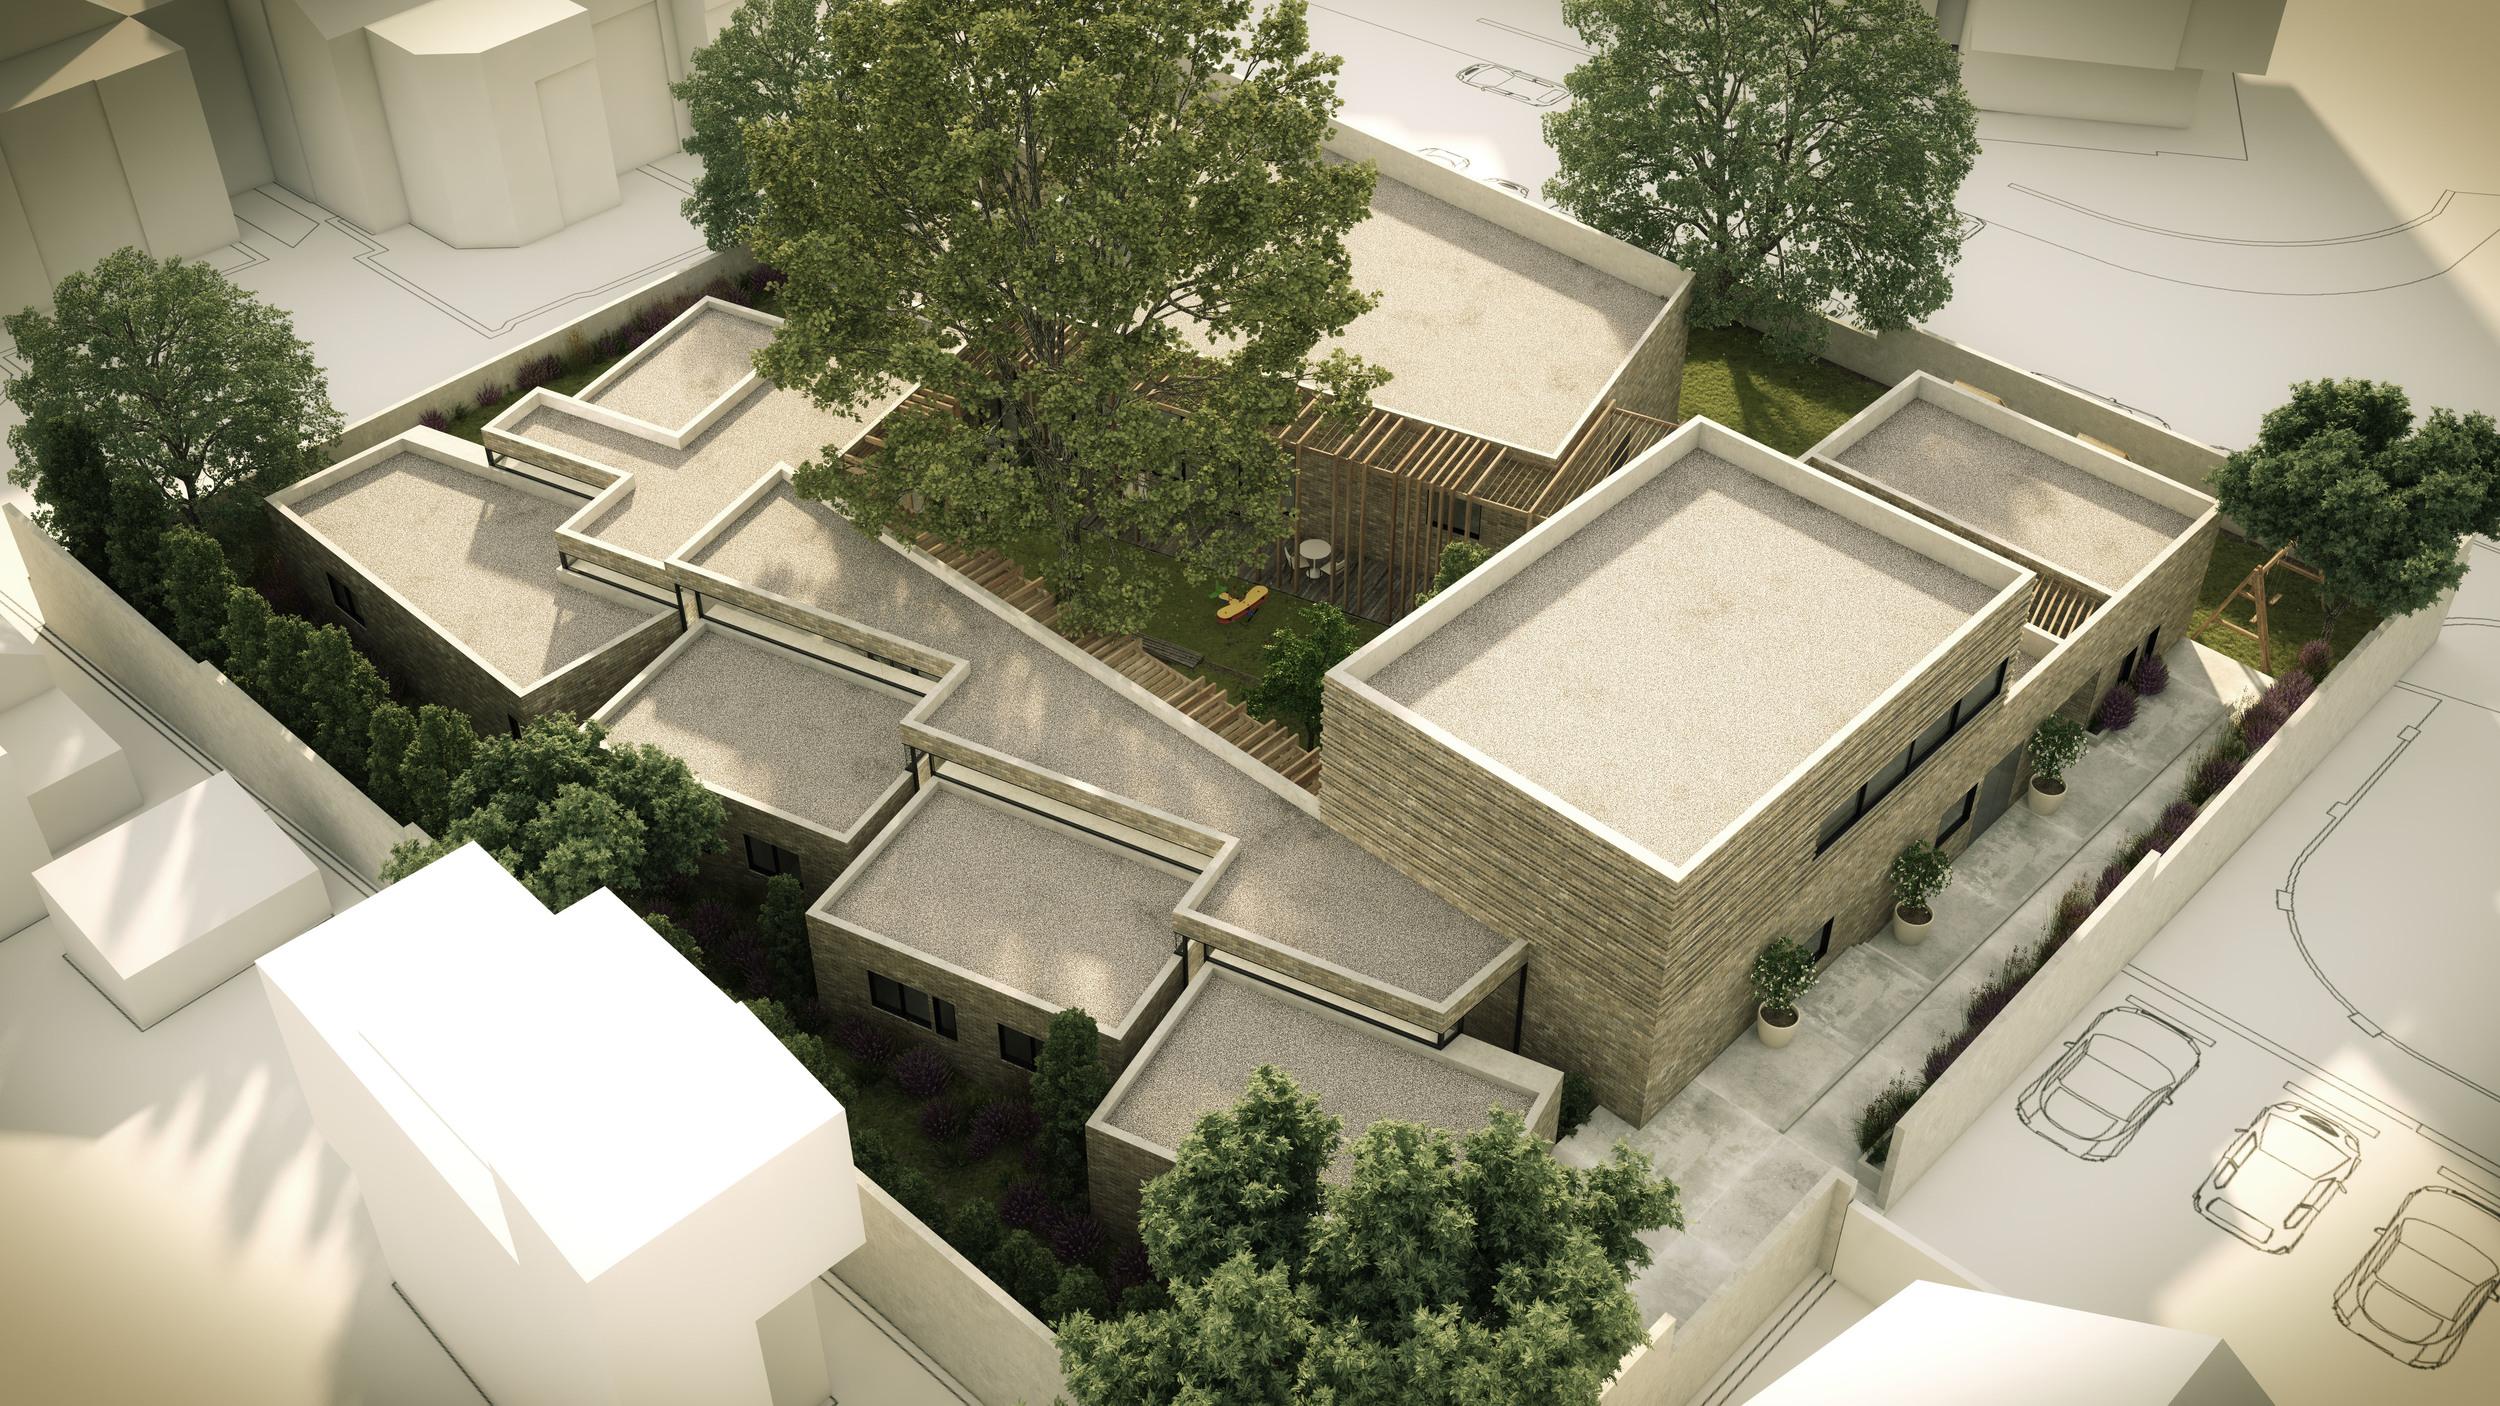 Proposed design of Shelter